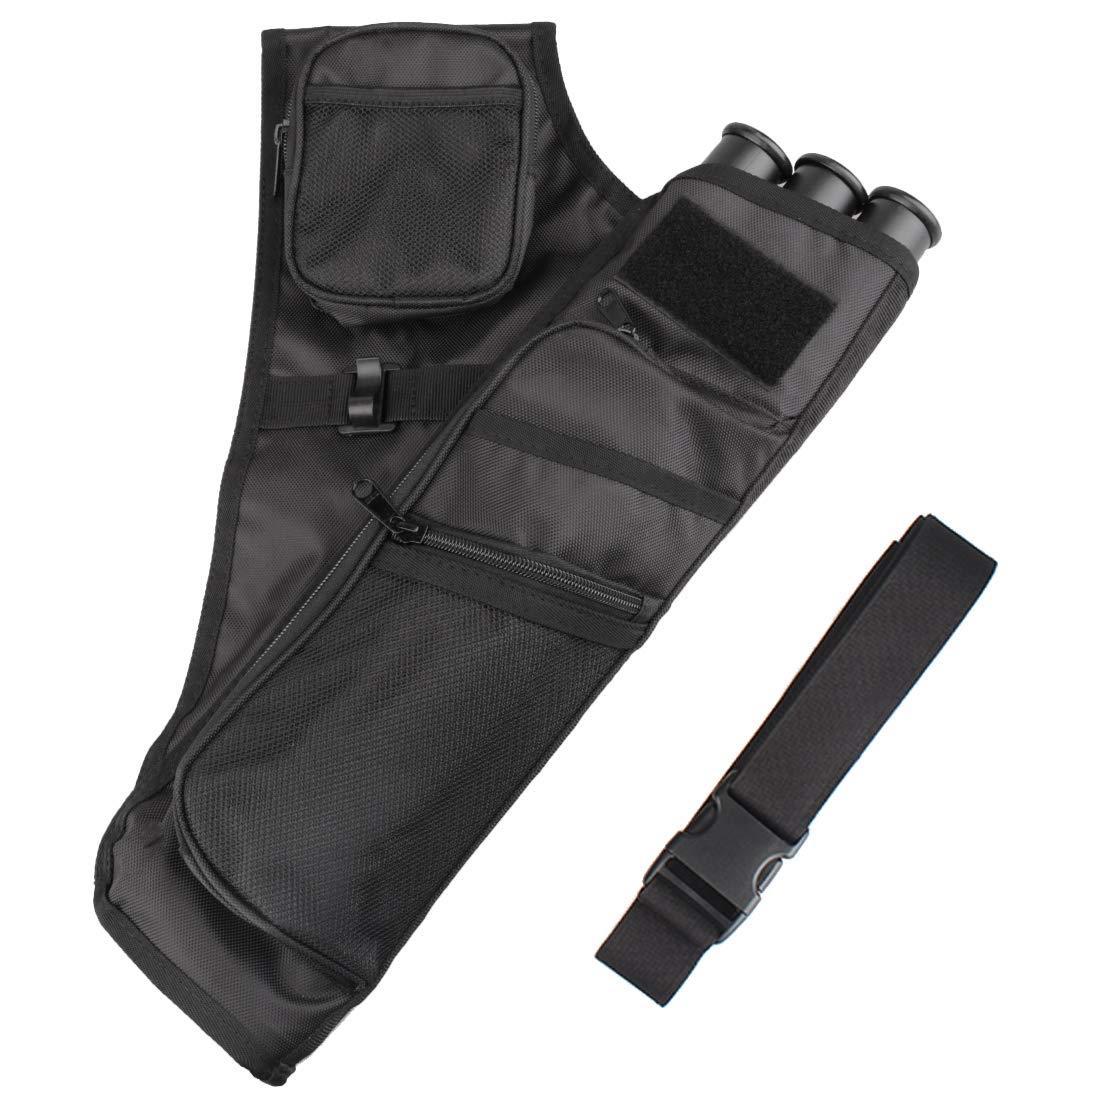 Kratarc 3-Tubes Hip Quiver Waist Hanged Camouflage Arrow Archery Carry Bag with Pockets Adjustable Belt (Black)